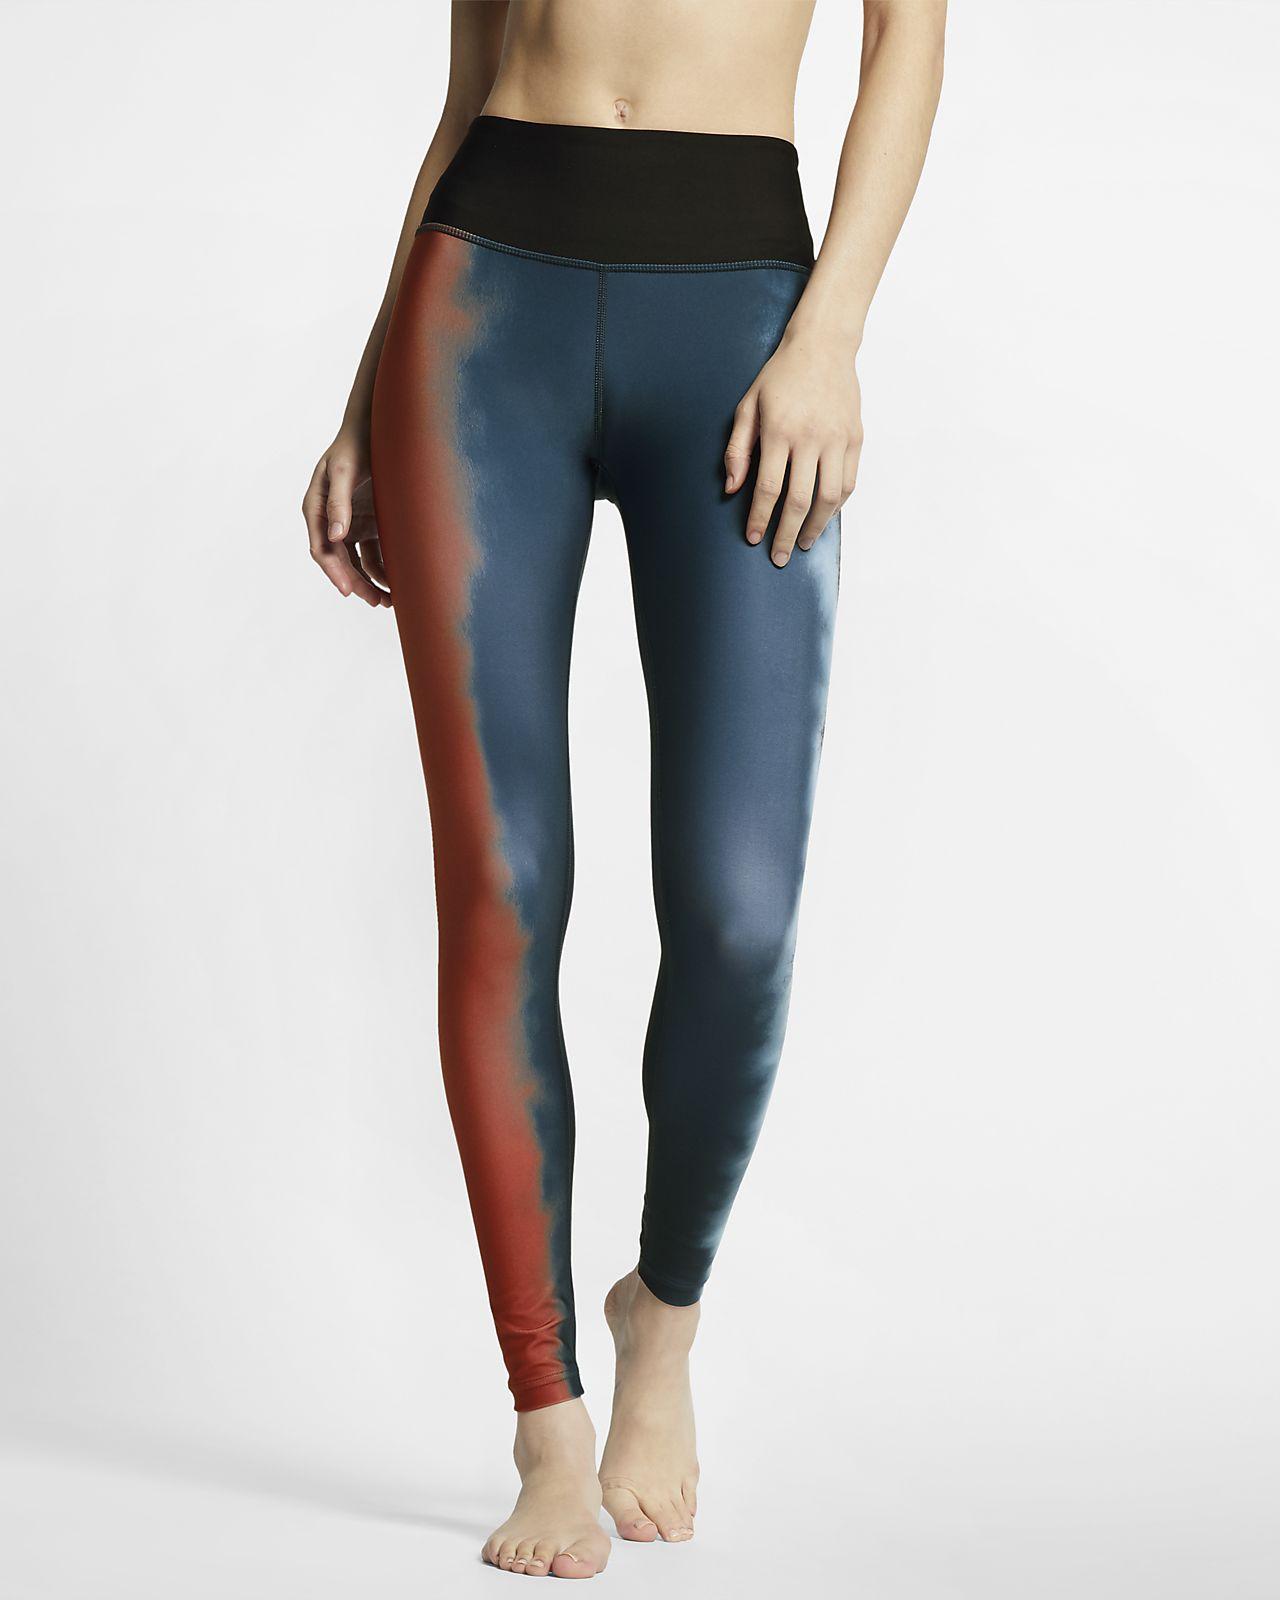 Hurley Quick Dry Gradient Women's Surf Leggings